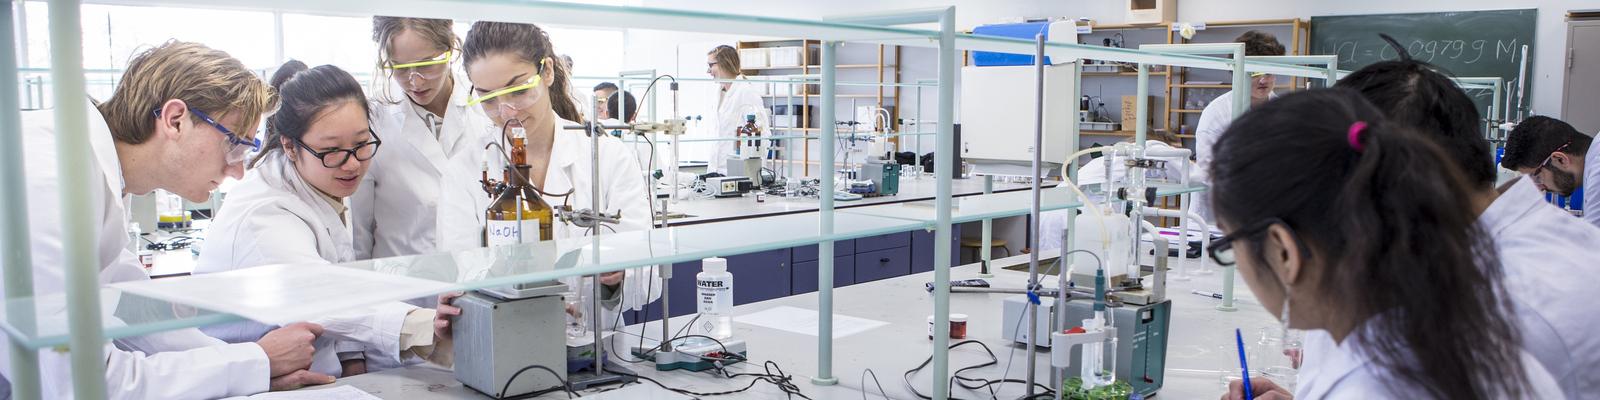 3D printen van levende weefsels (20 november 2019)